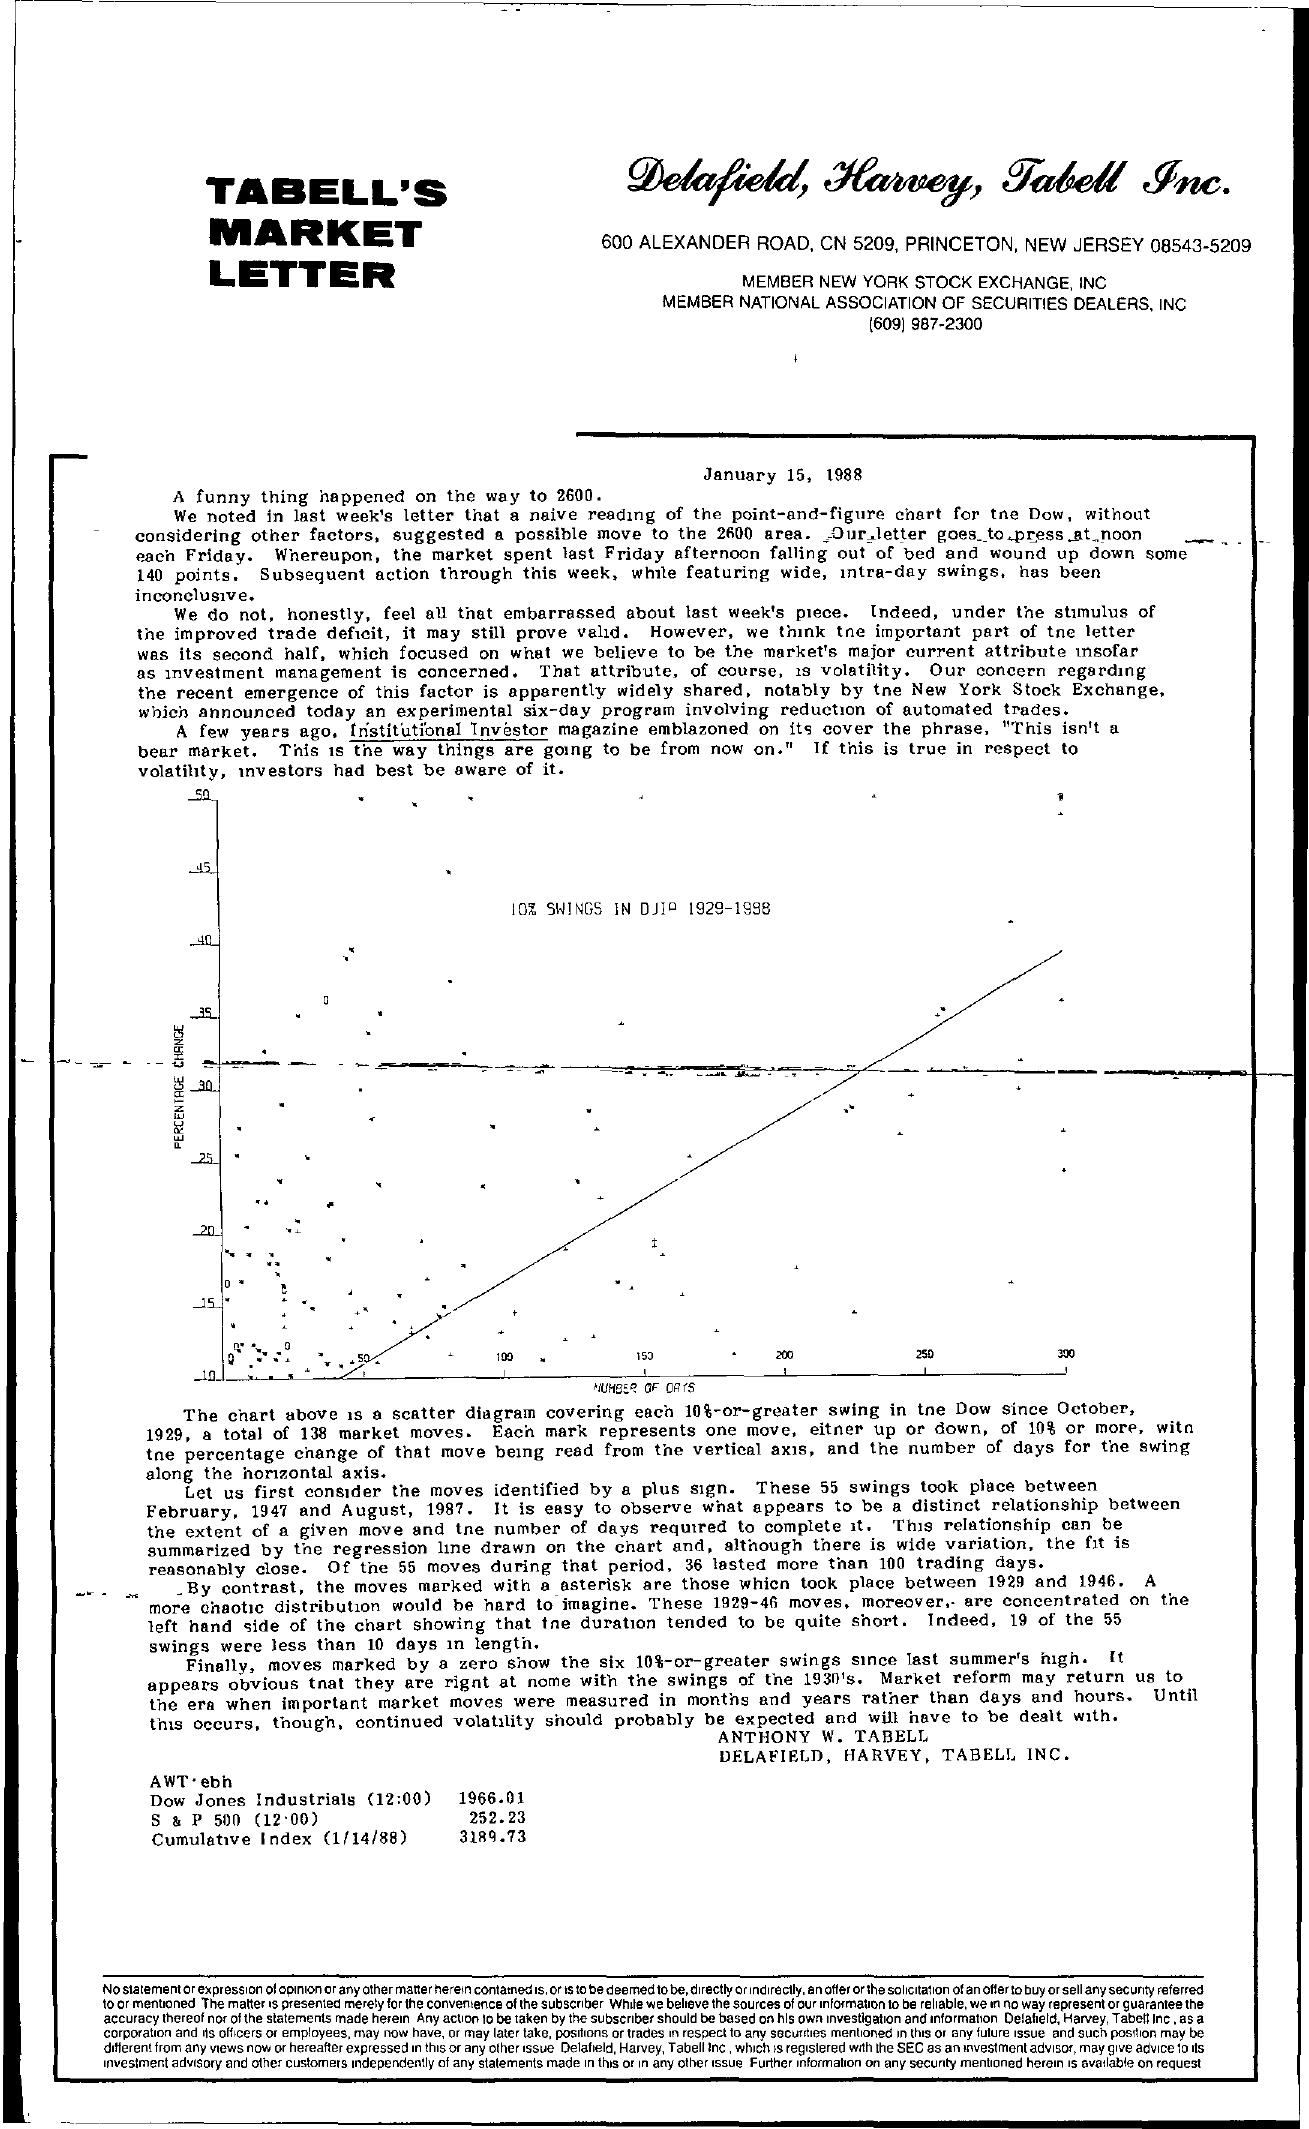 Tabell's Market Letter - January 15, 1988